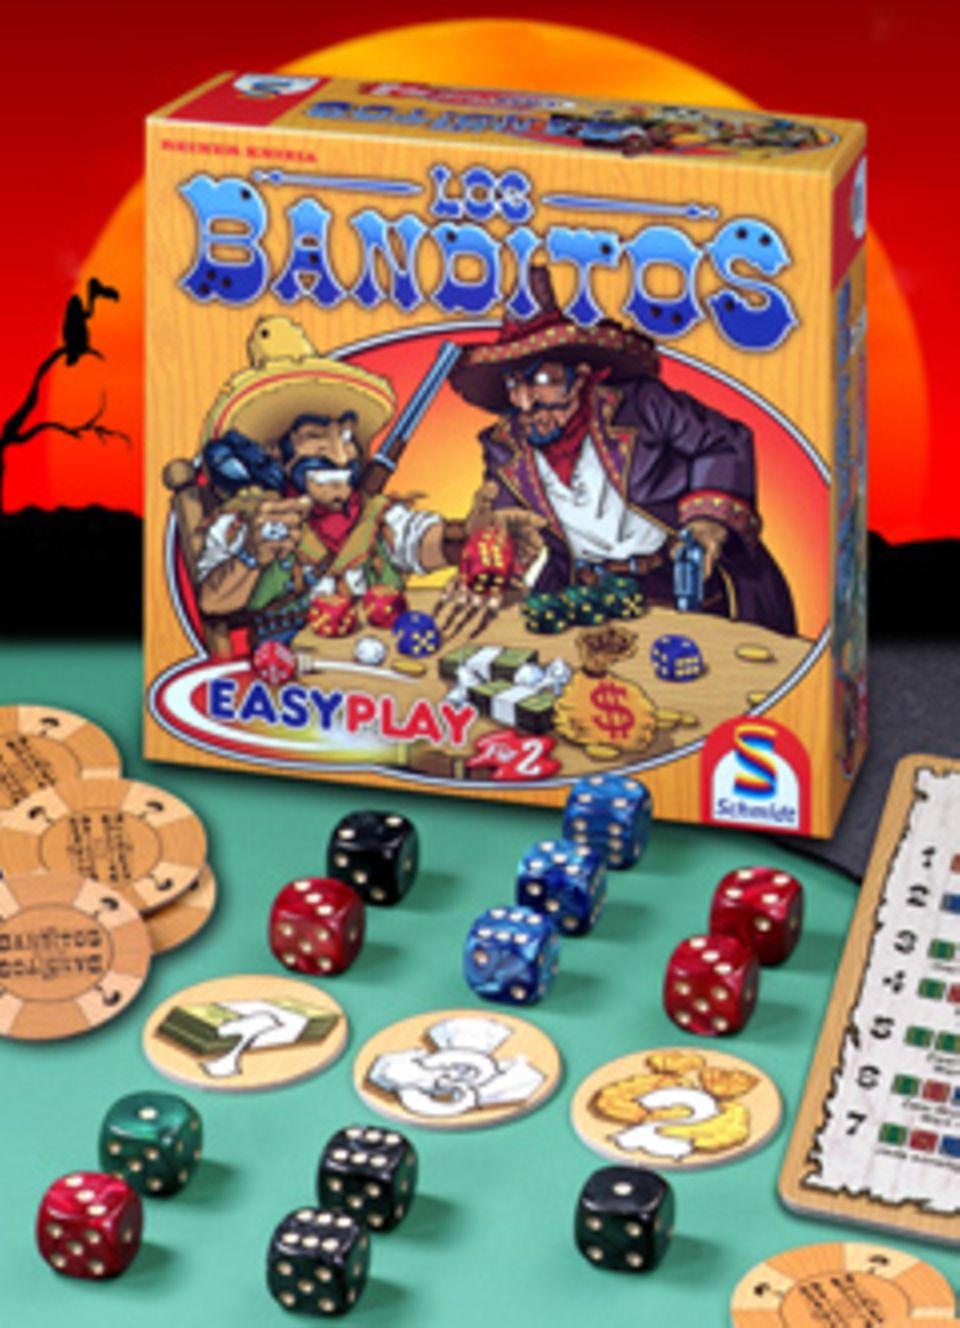 Brettspieltipp: Los Banditos